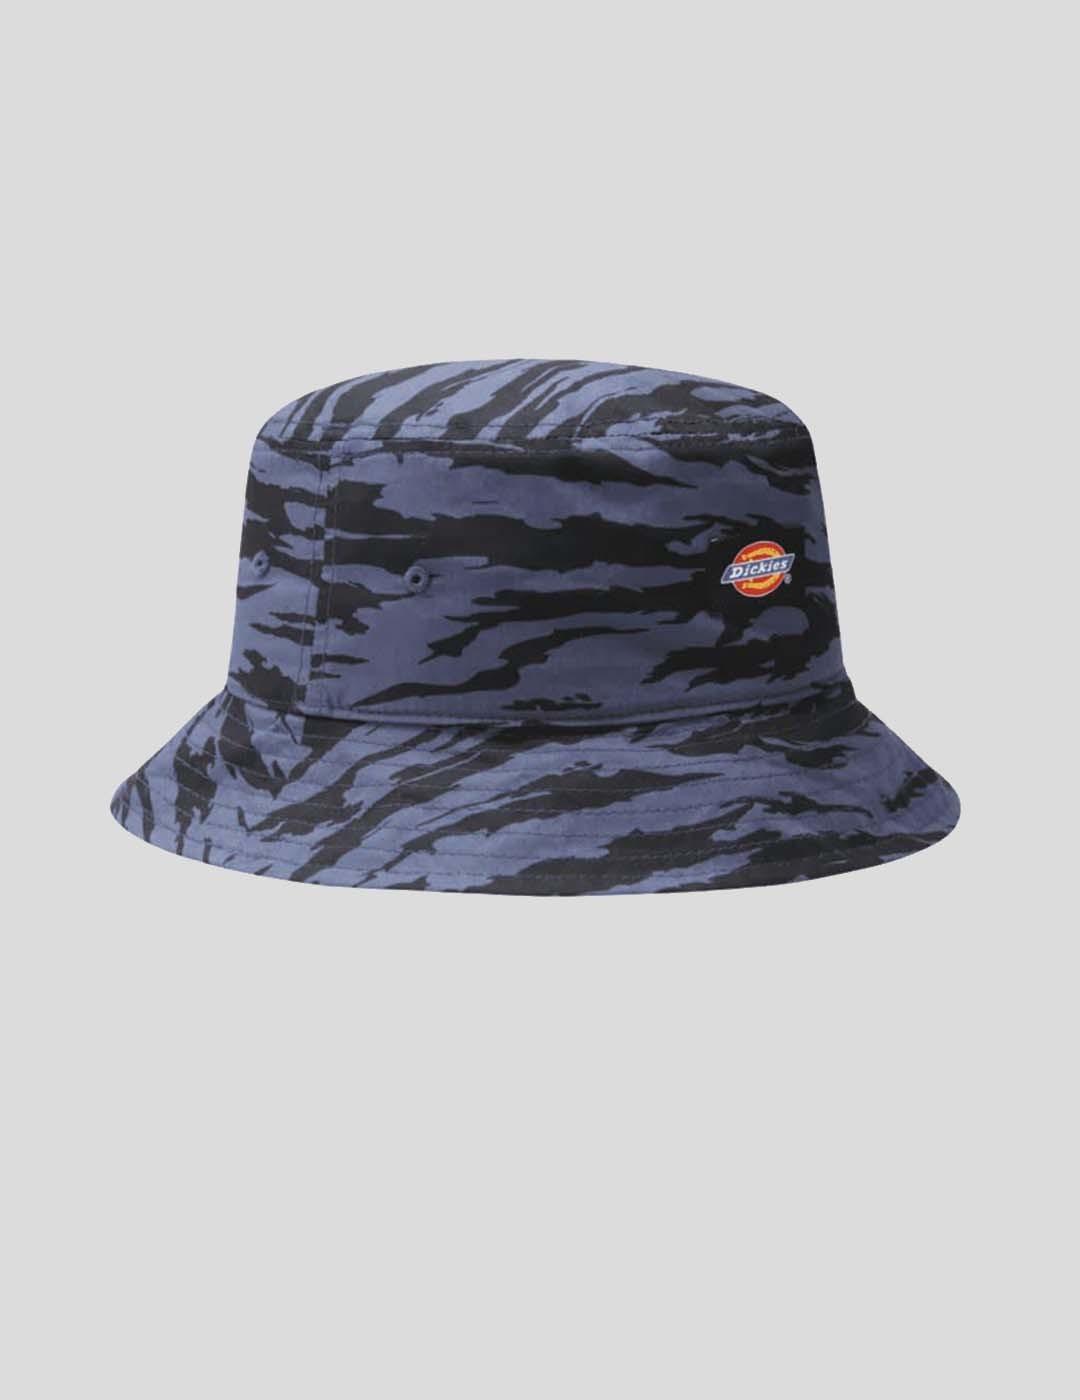 GORRA DICKIES QUAMBA BUCKET HAT NAVY BLUE